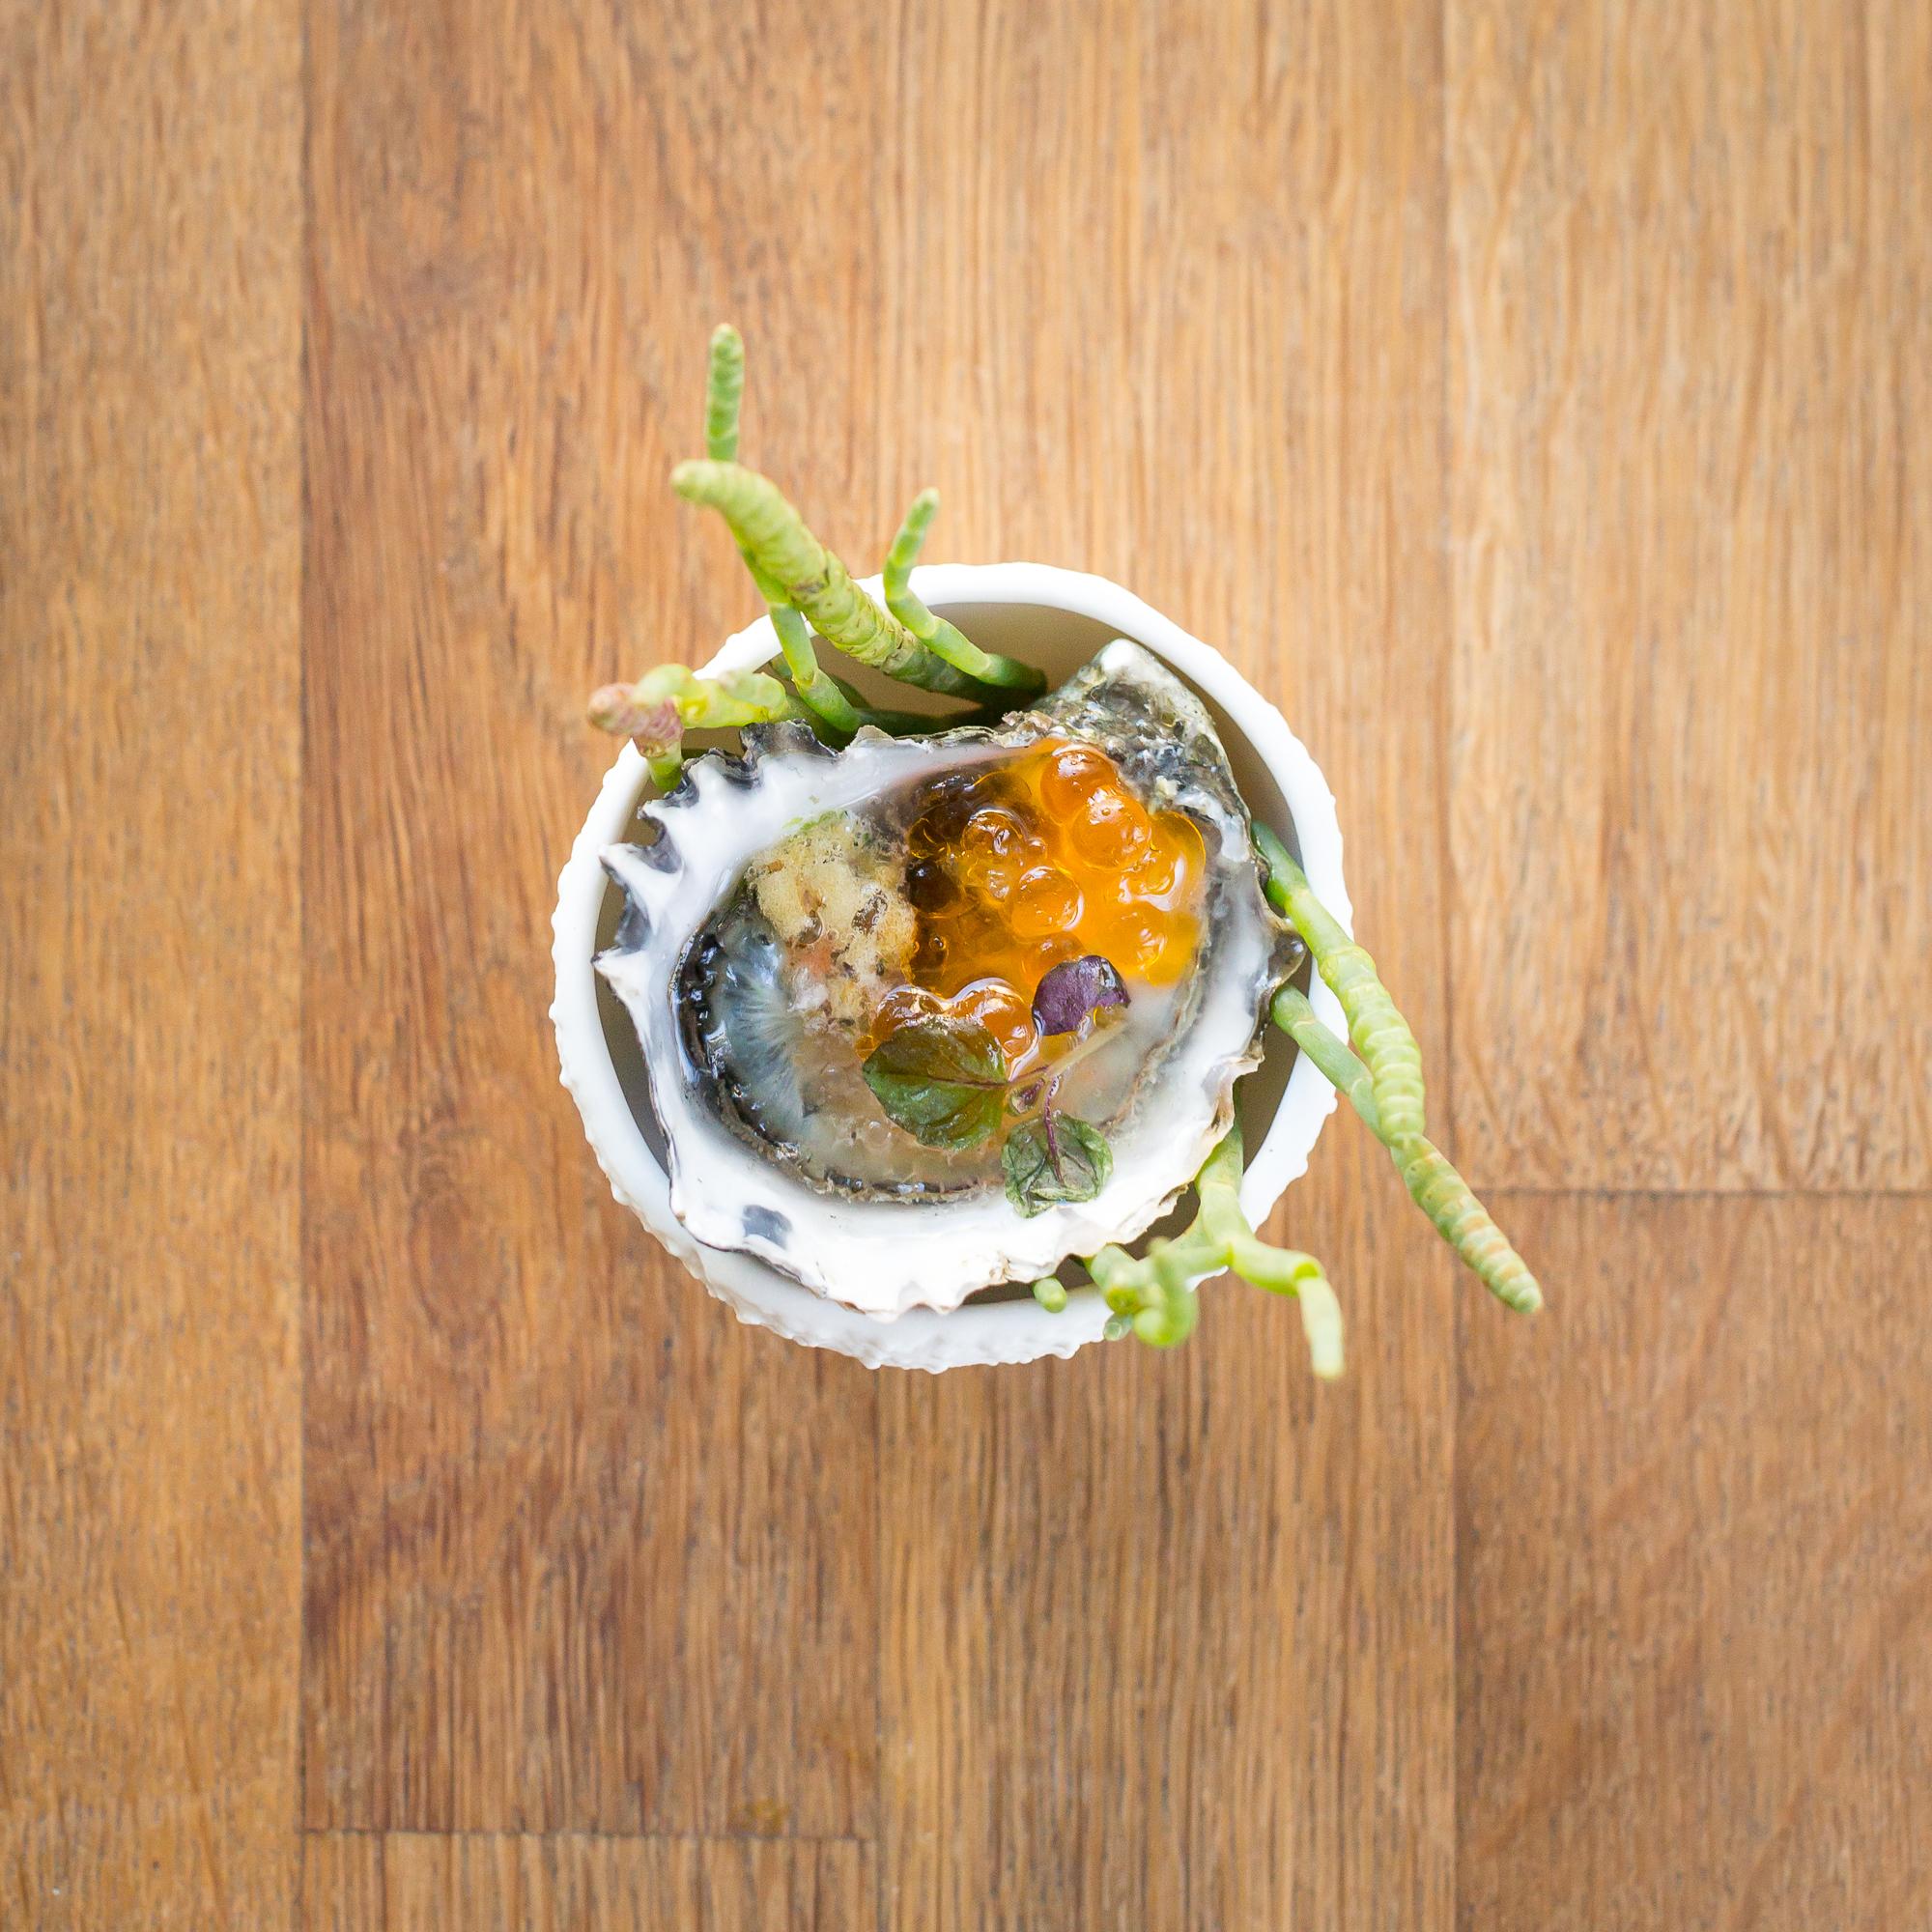 kumamoto oyster with chili caviar/finger lime/furikake poprocks